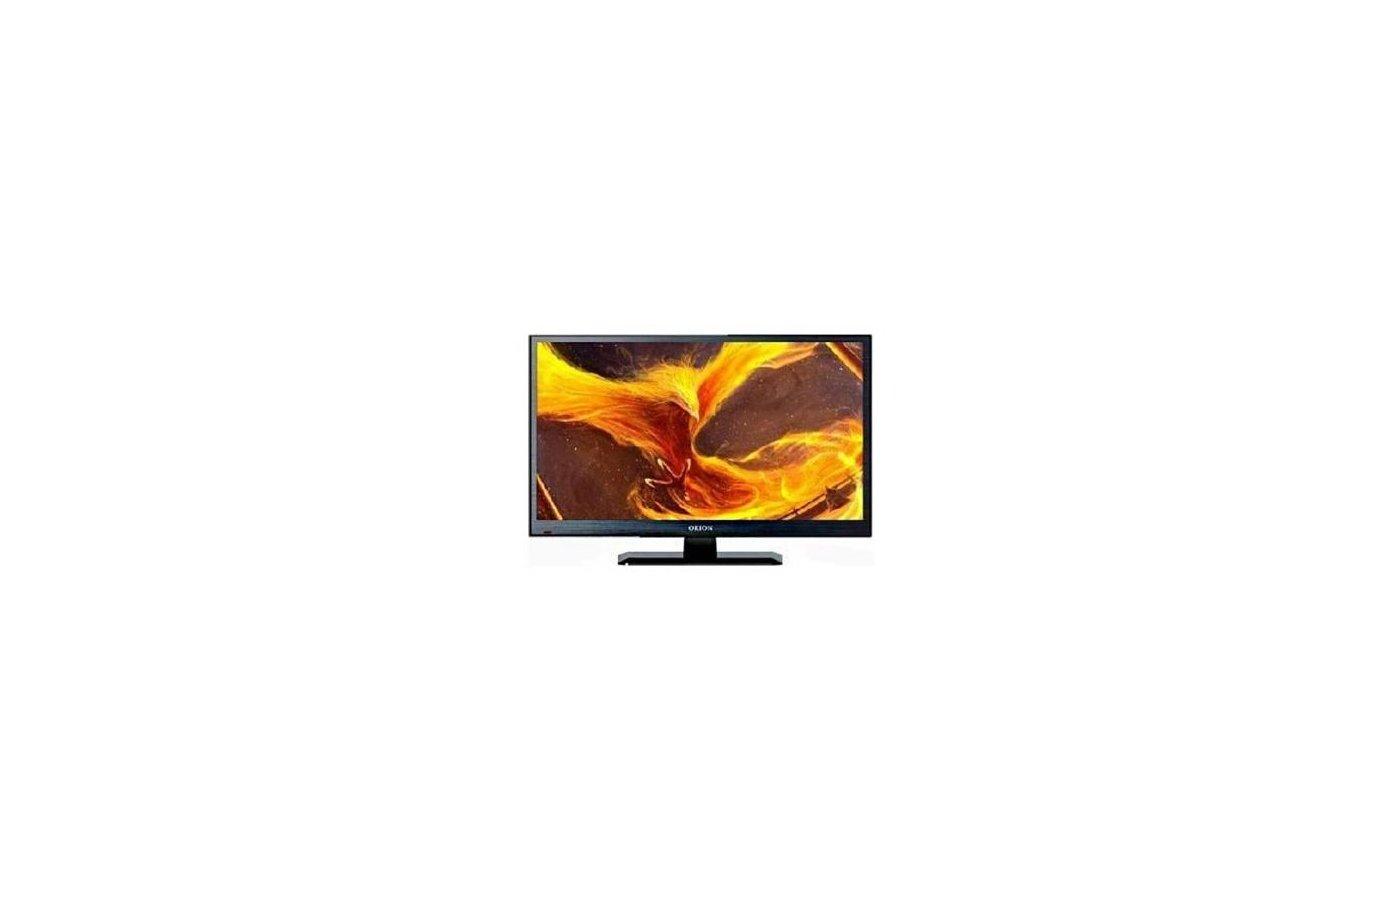 LED телевизор Orion OLT-16100